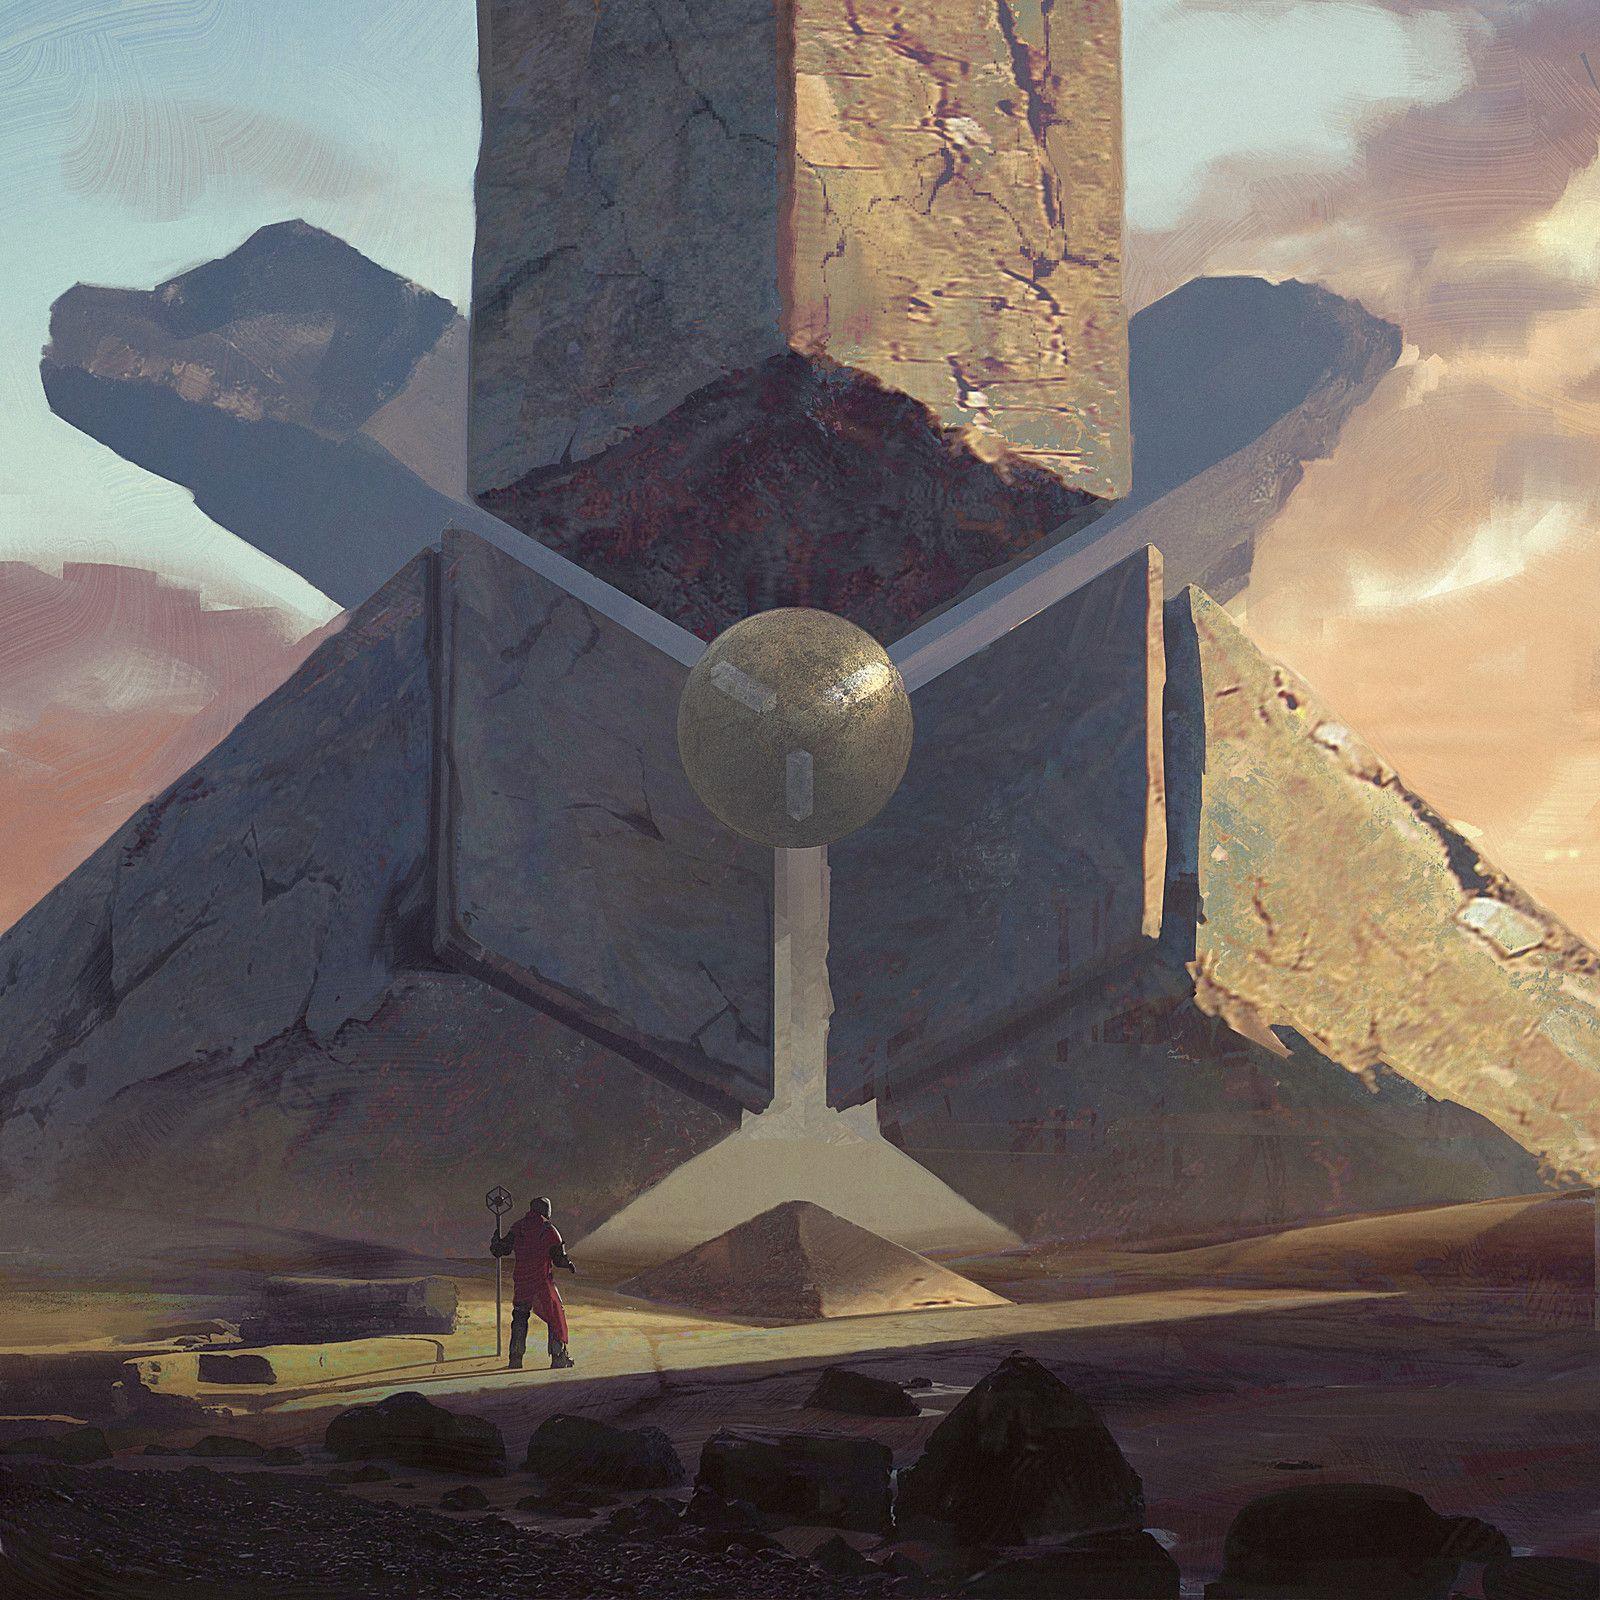 Beacon of knowledge , Darius Kalinauskas on ArtStation at https://www.artstation.com/artwork/Gz04Q